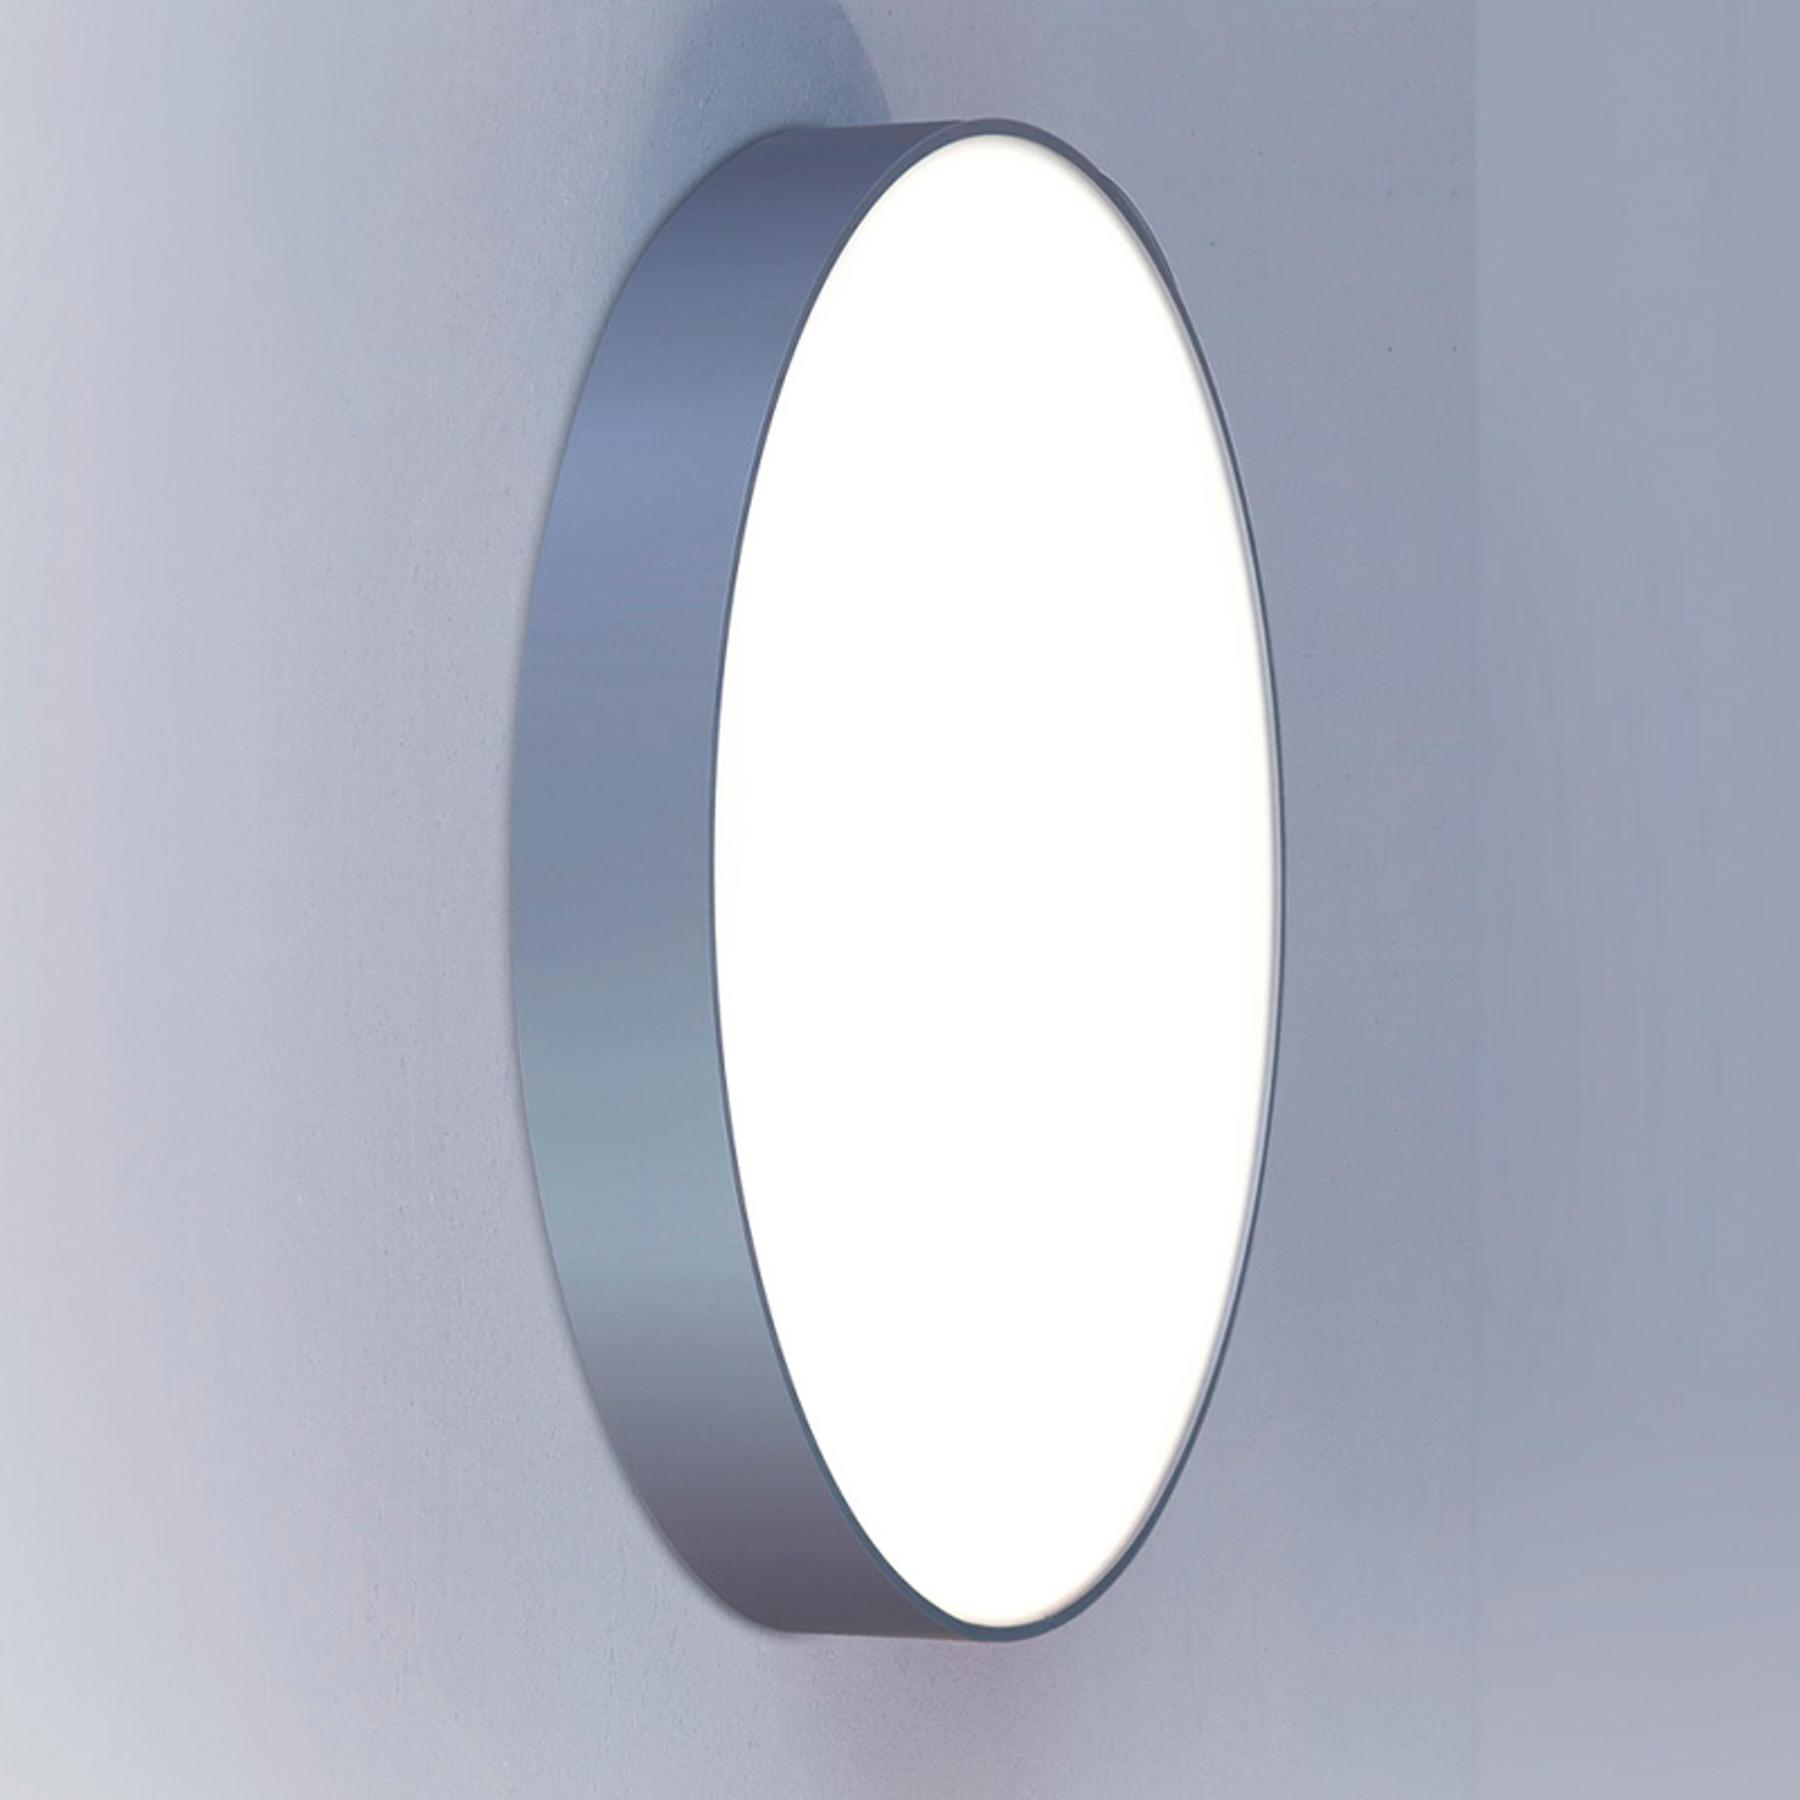 Ronde wandlamp Basic-A1 zilver